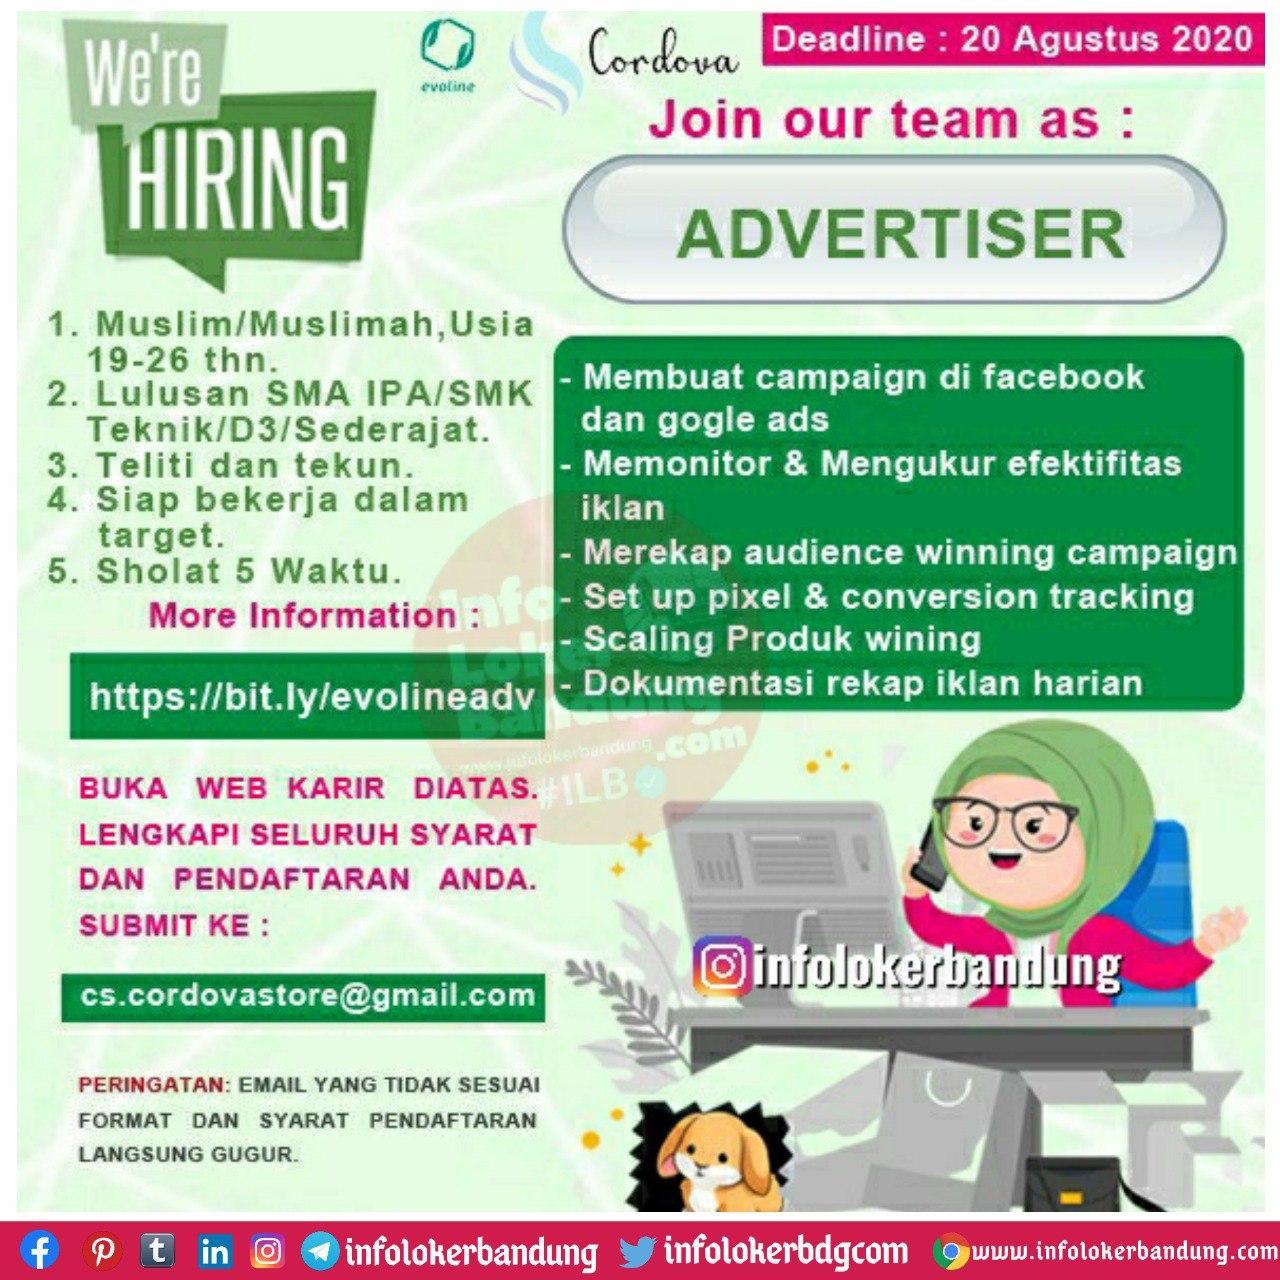 Lowongan Kerja Cordova Group Bandung Agustus 2020